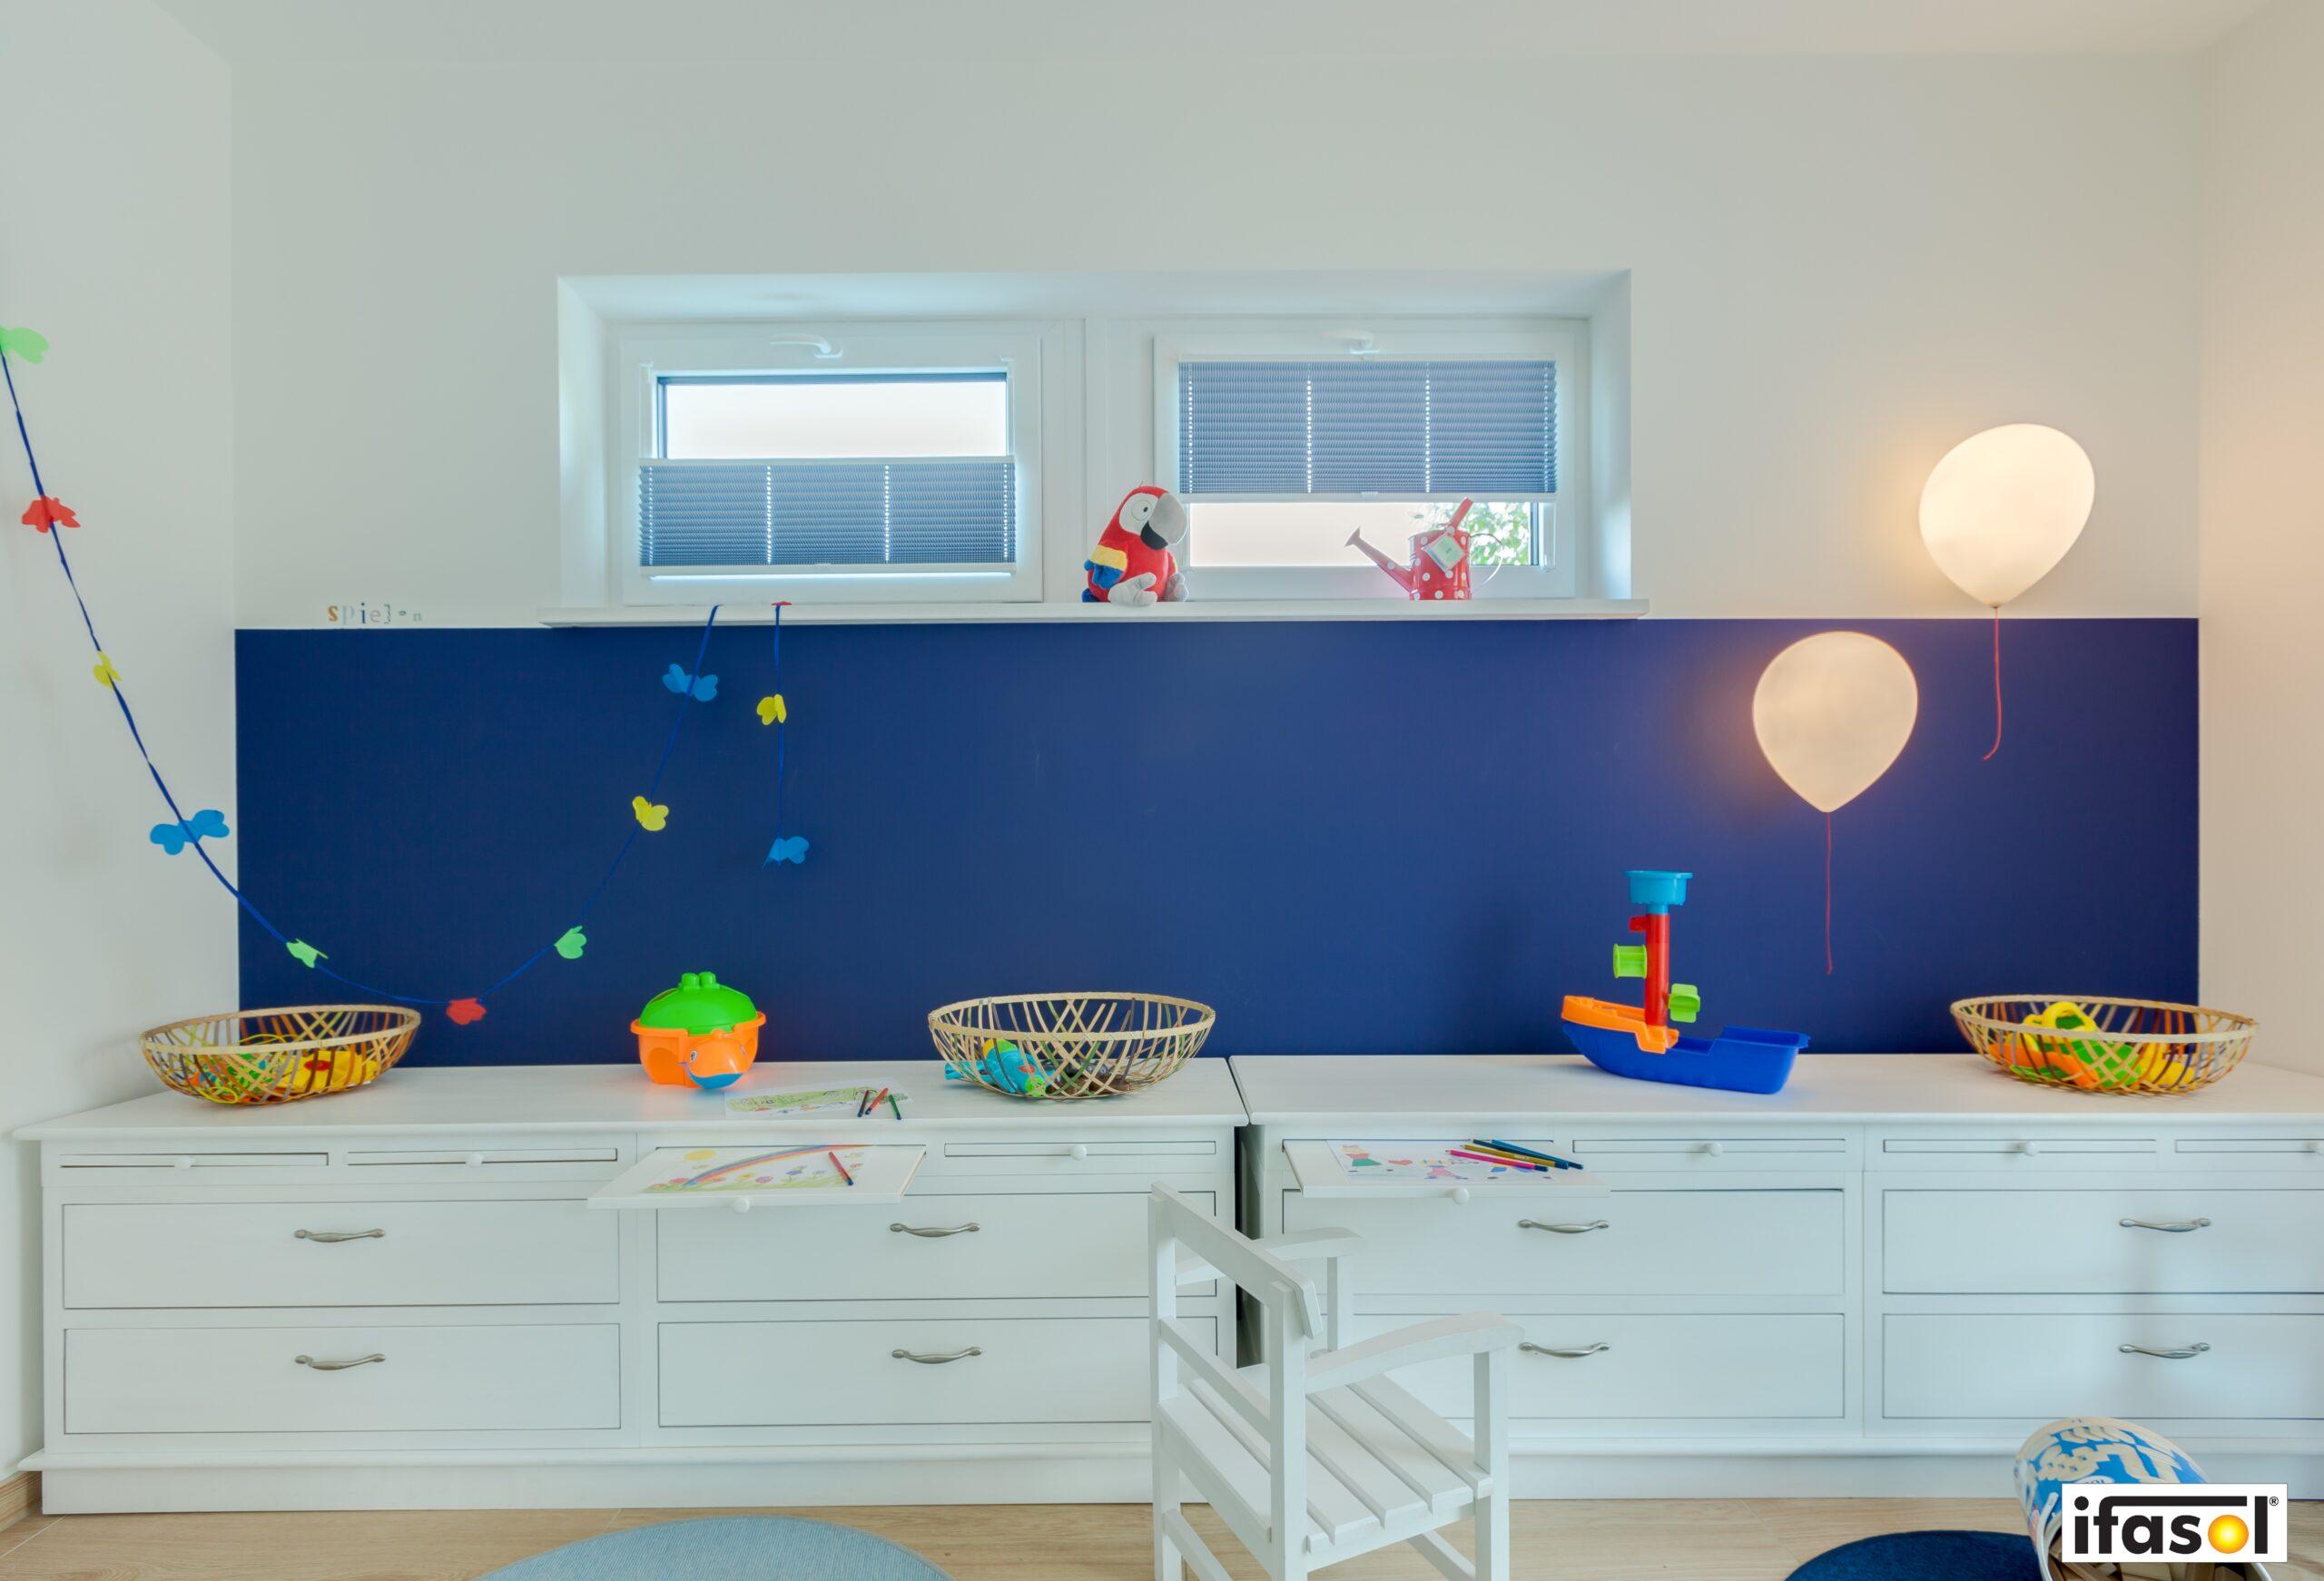 Full Size of Plissee Kinderzimmer Fr Ihr Ttl Ttm Regale Regal Fenster Weiß Sofa Kinderzimmer Plissee Kinderzimmer